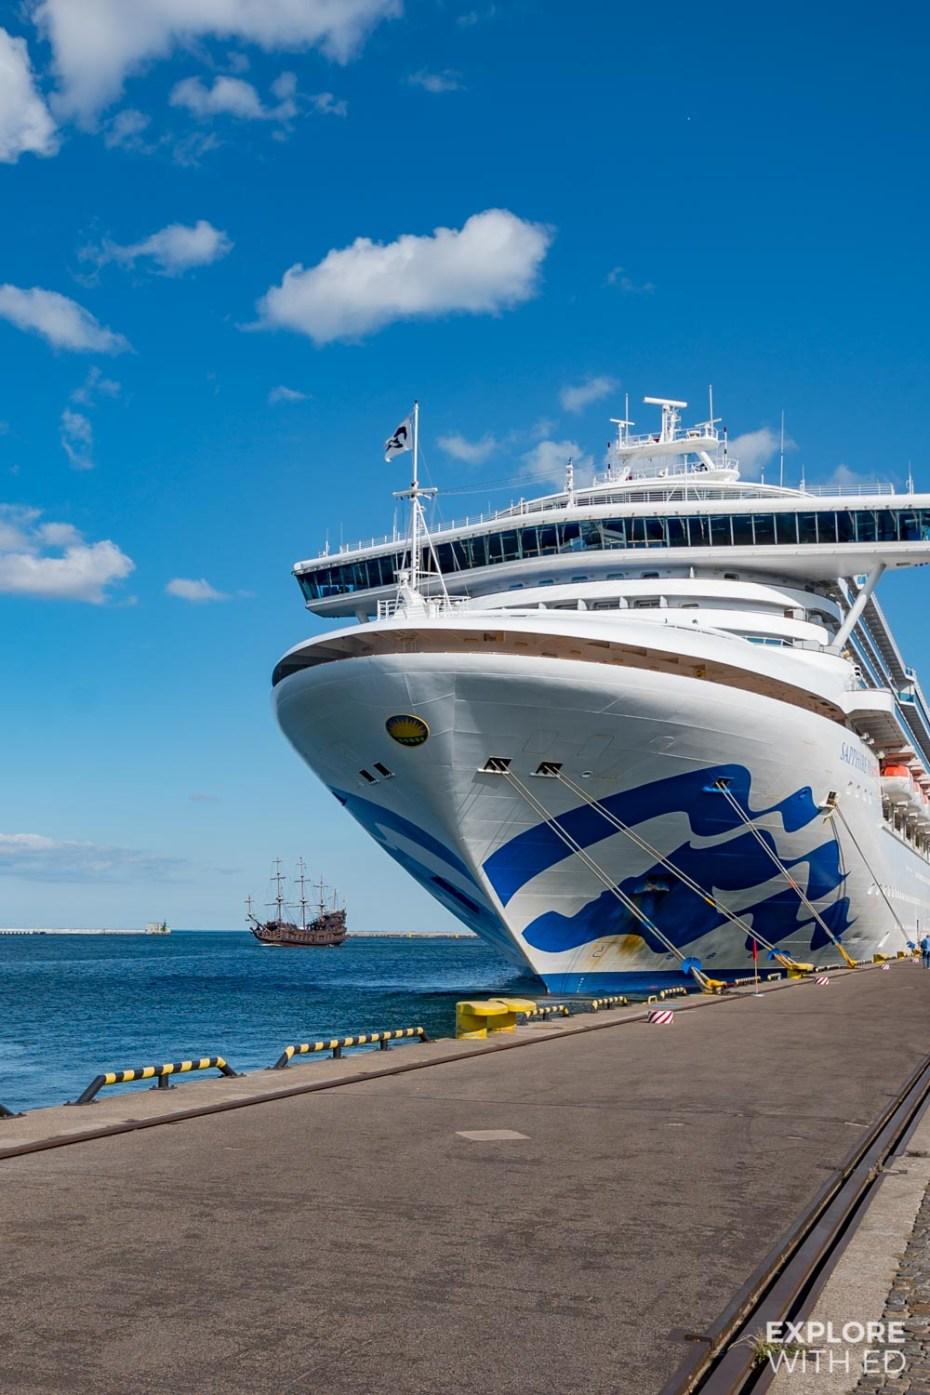 Cruise ship docked in Gdynia, Poland